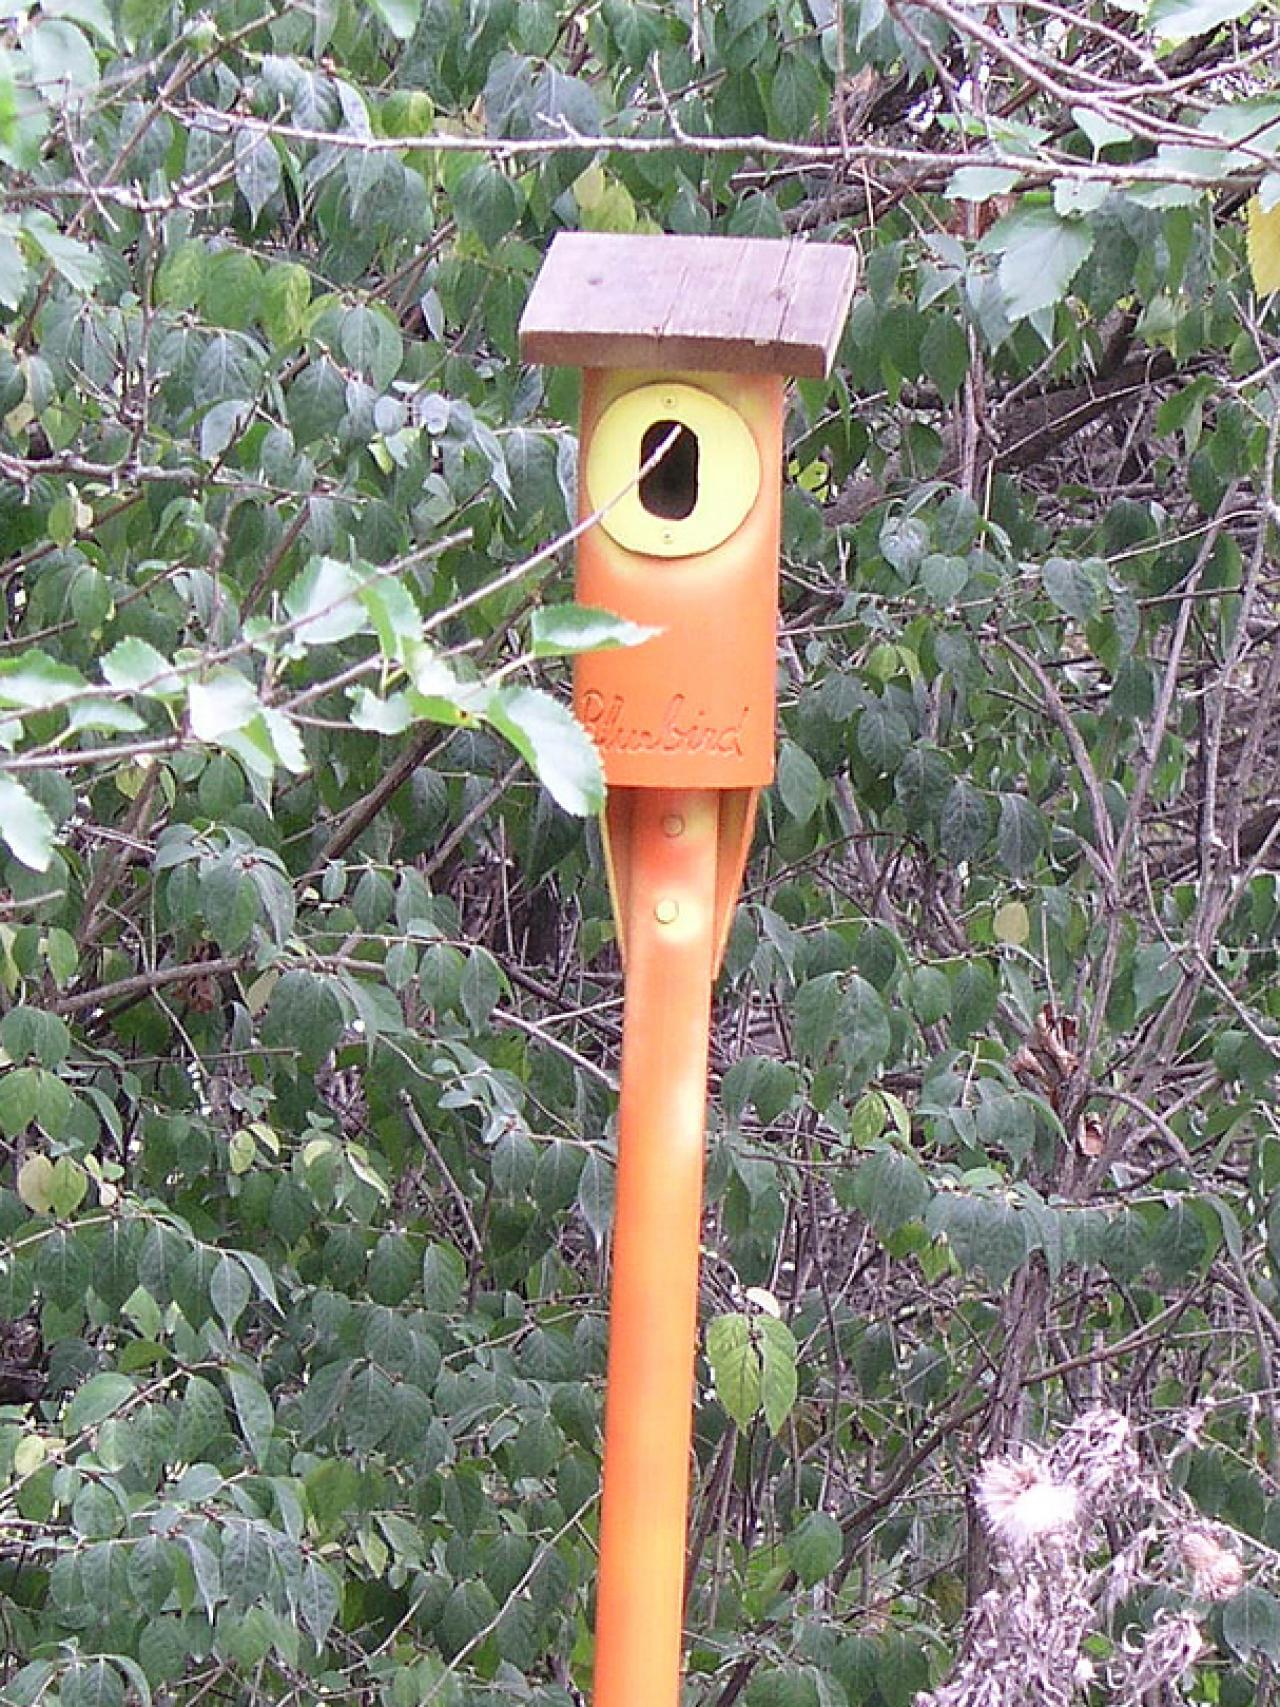 Diy Birdhouse How To Build A Birdhouse With Pvc Pipe Diy